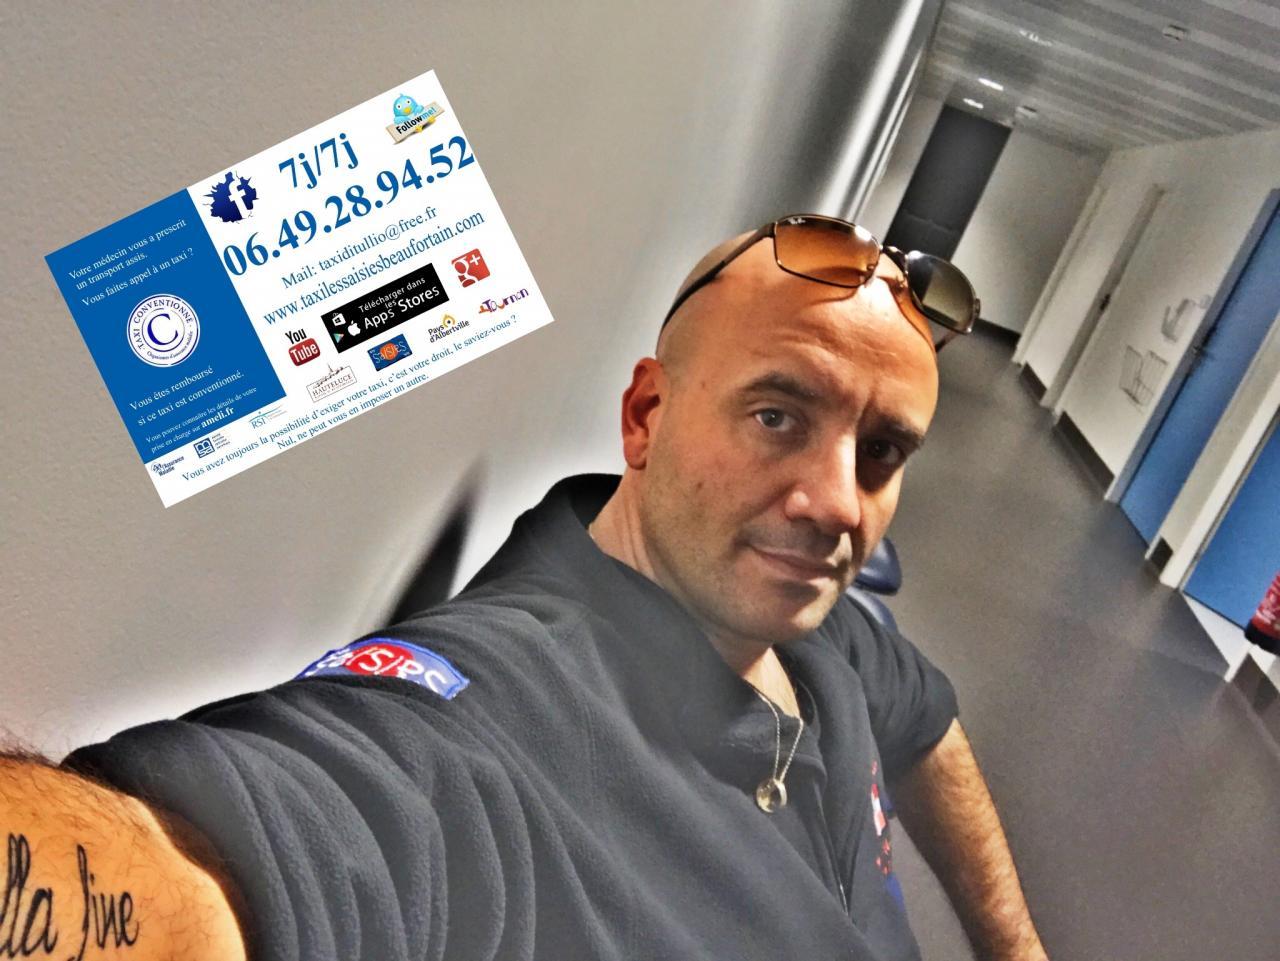 Taxi Di Tullio agréé CPAM